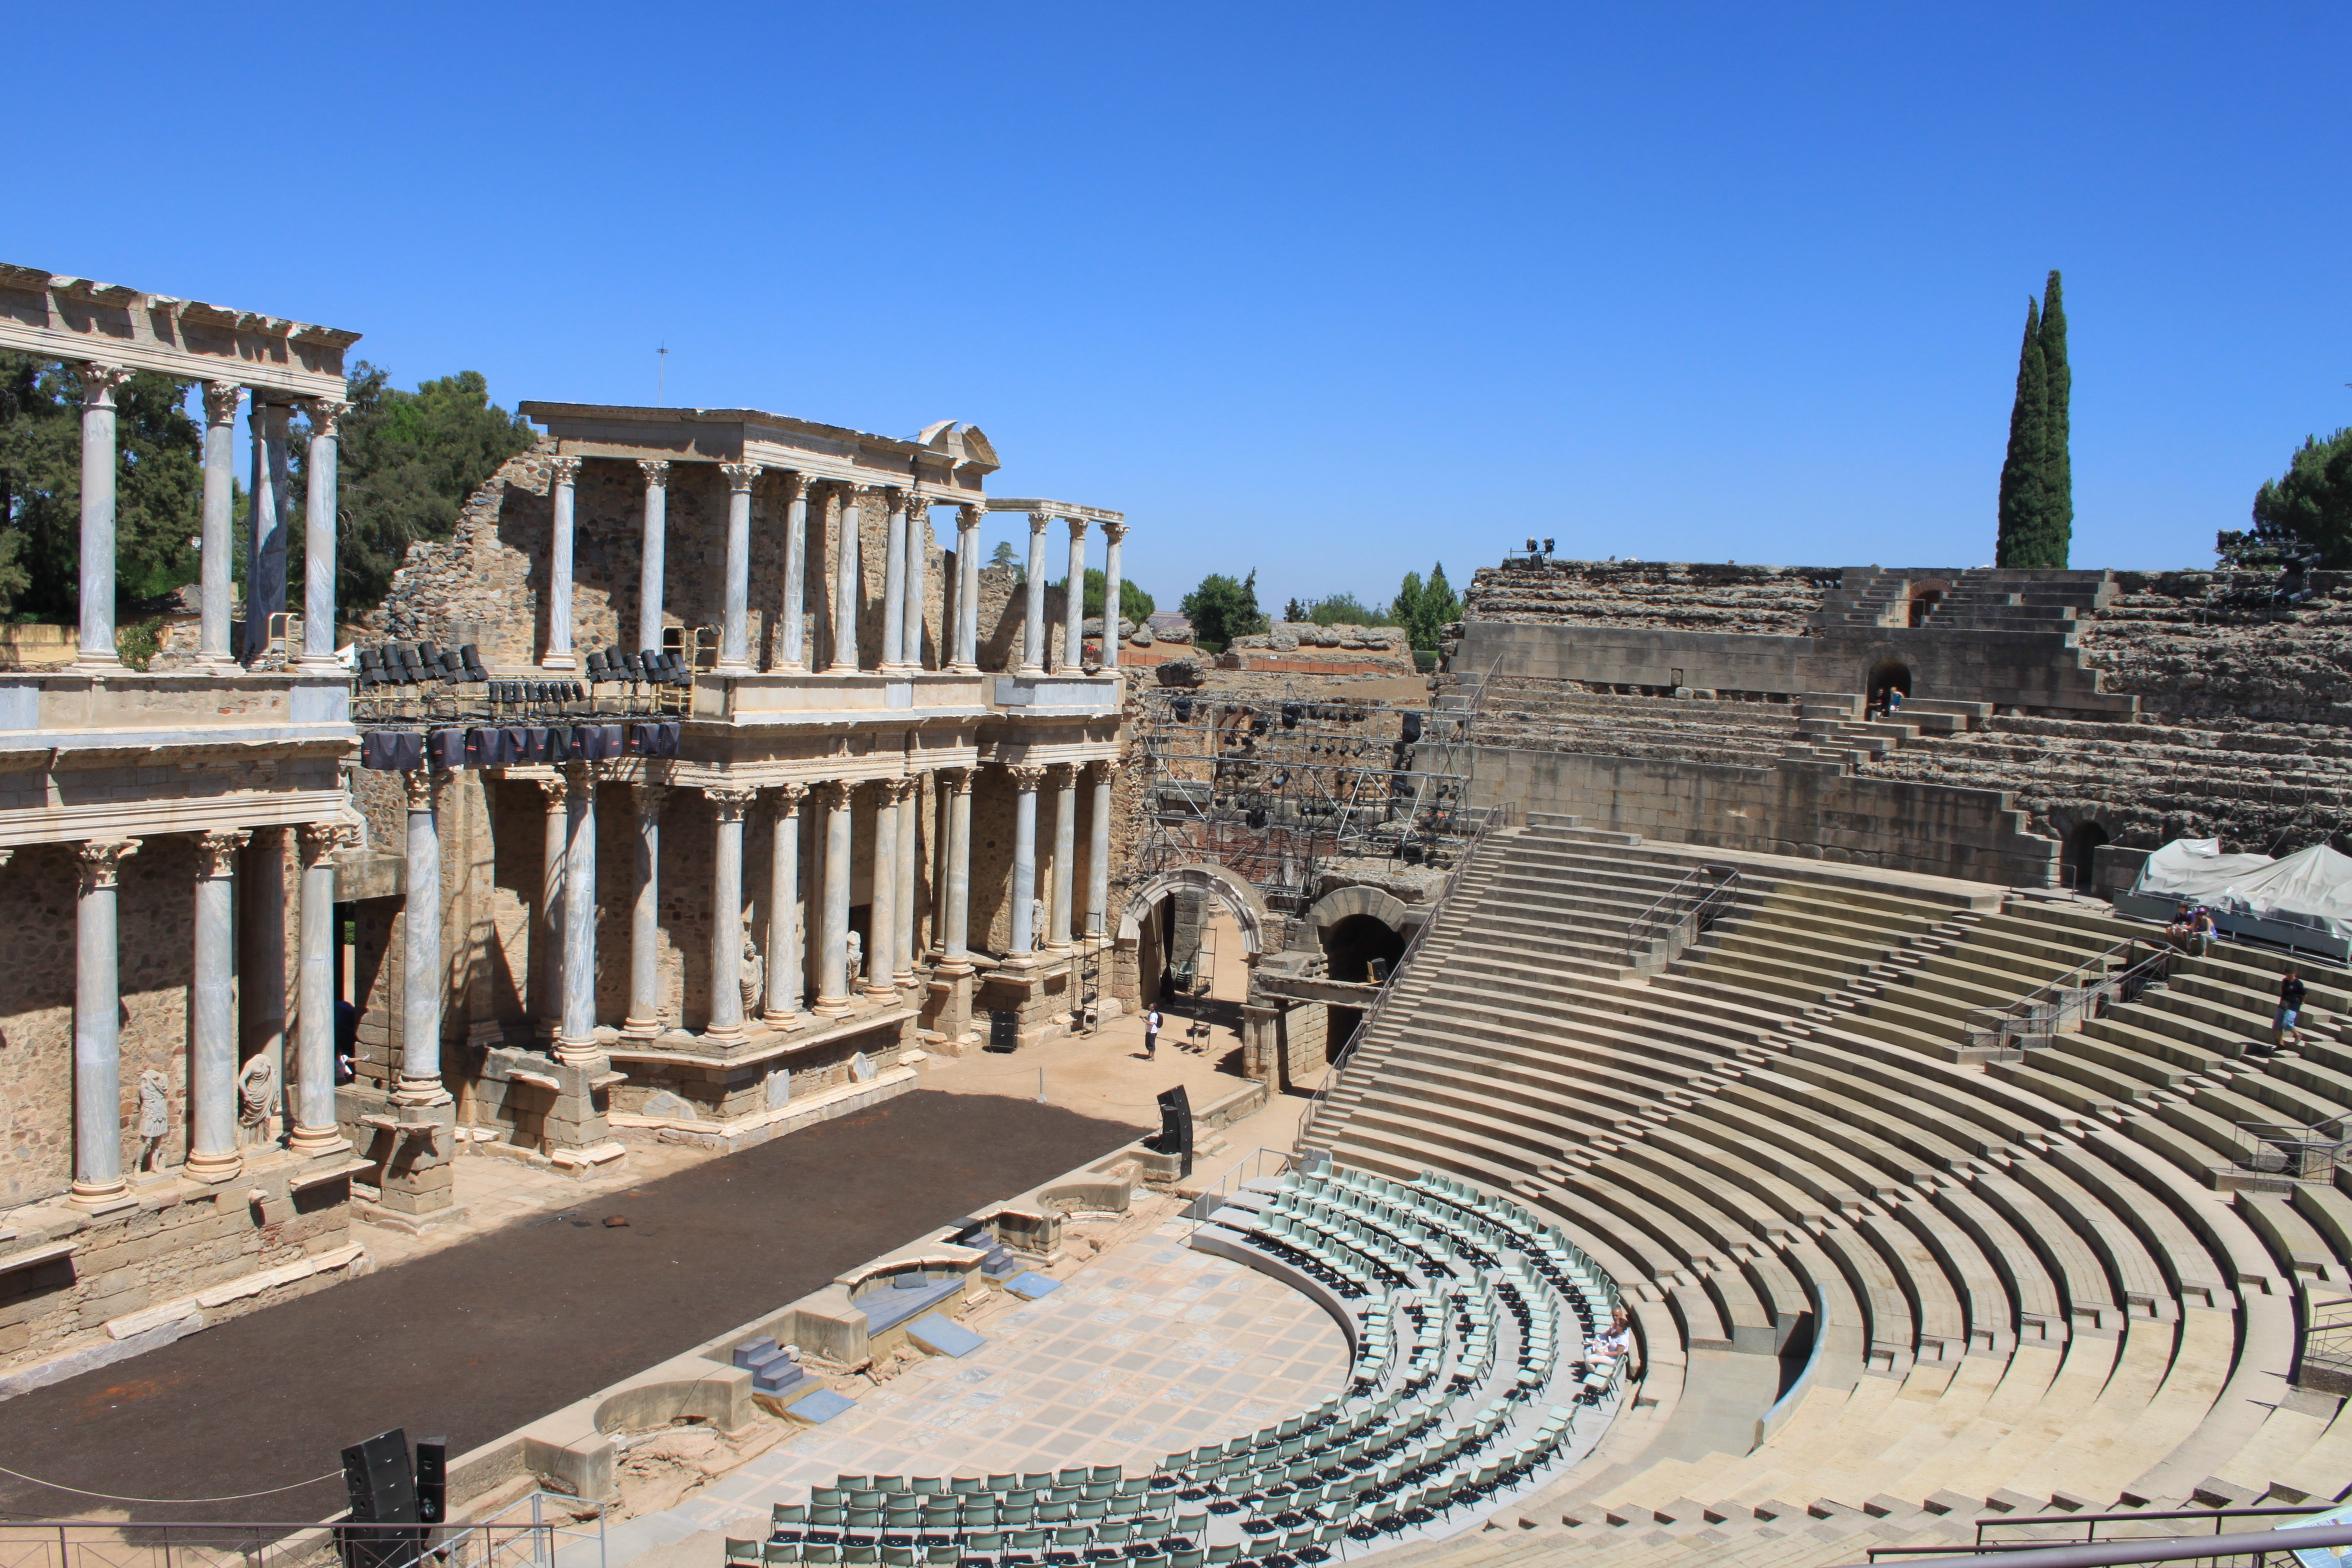 File:Teatro Romano de Mérida (3).JPG - Wikimedia Commons